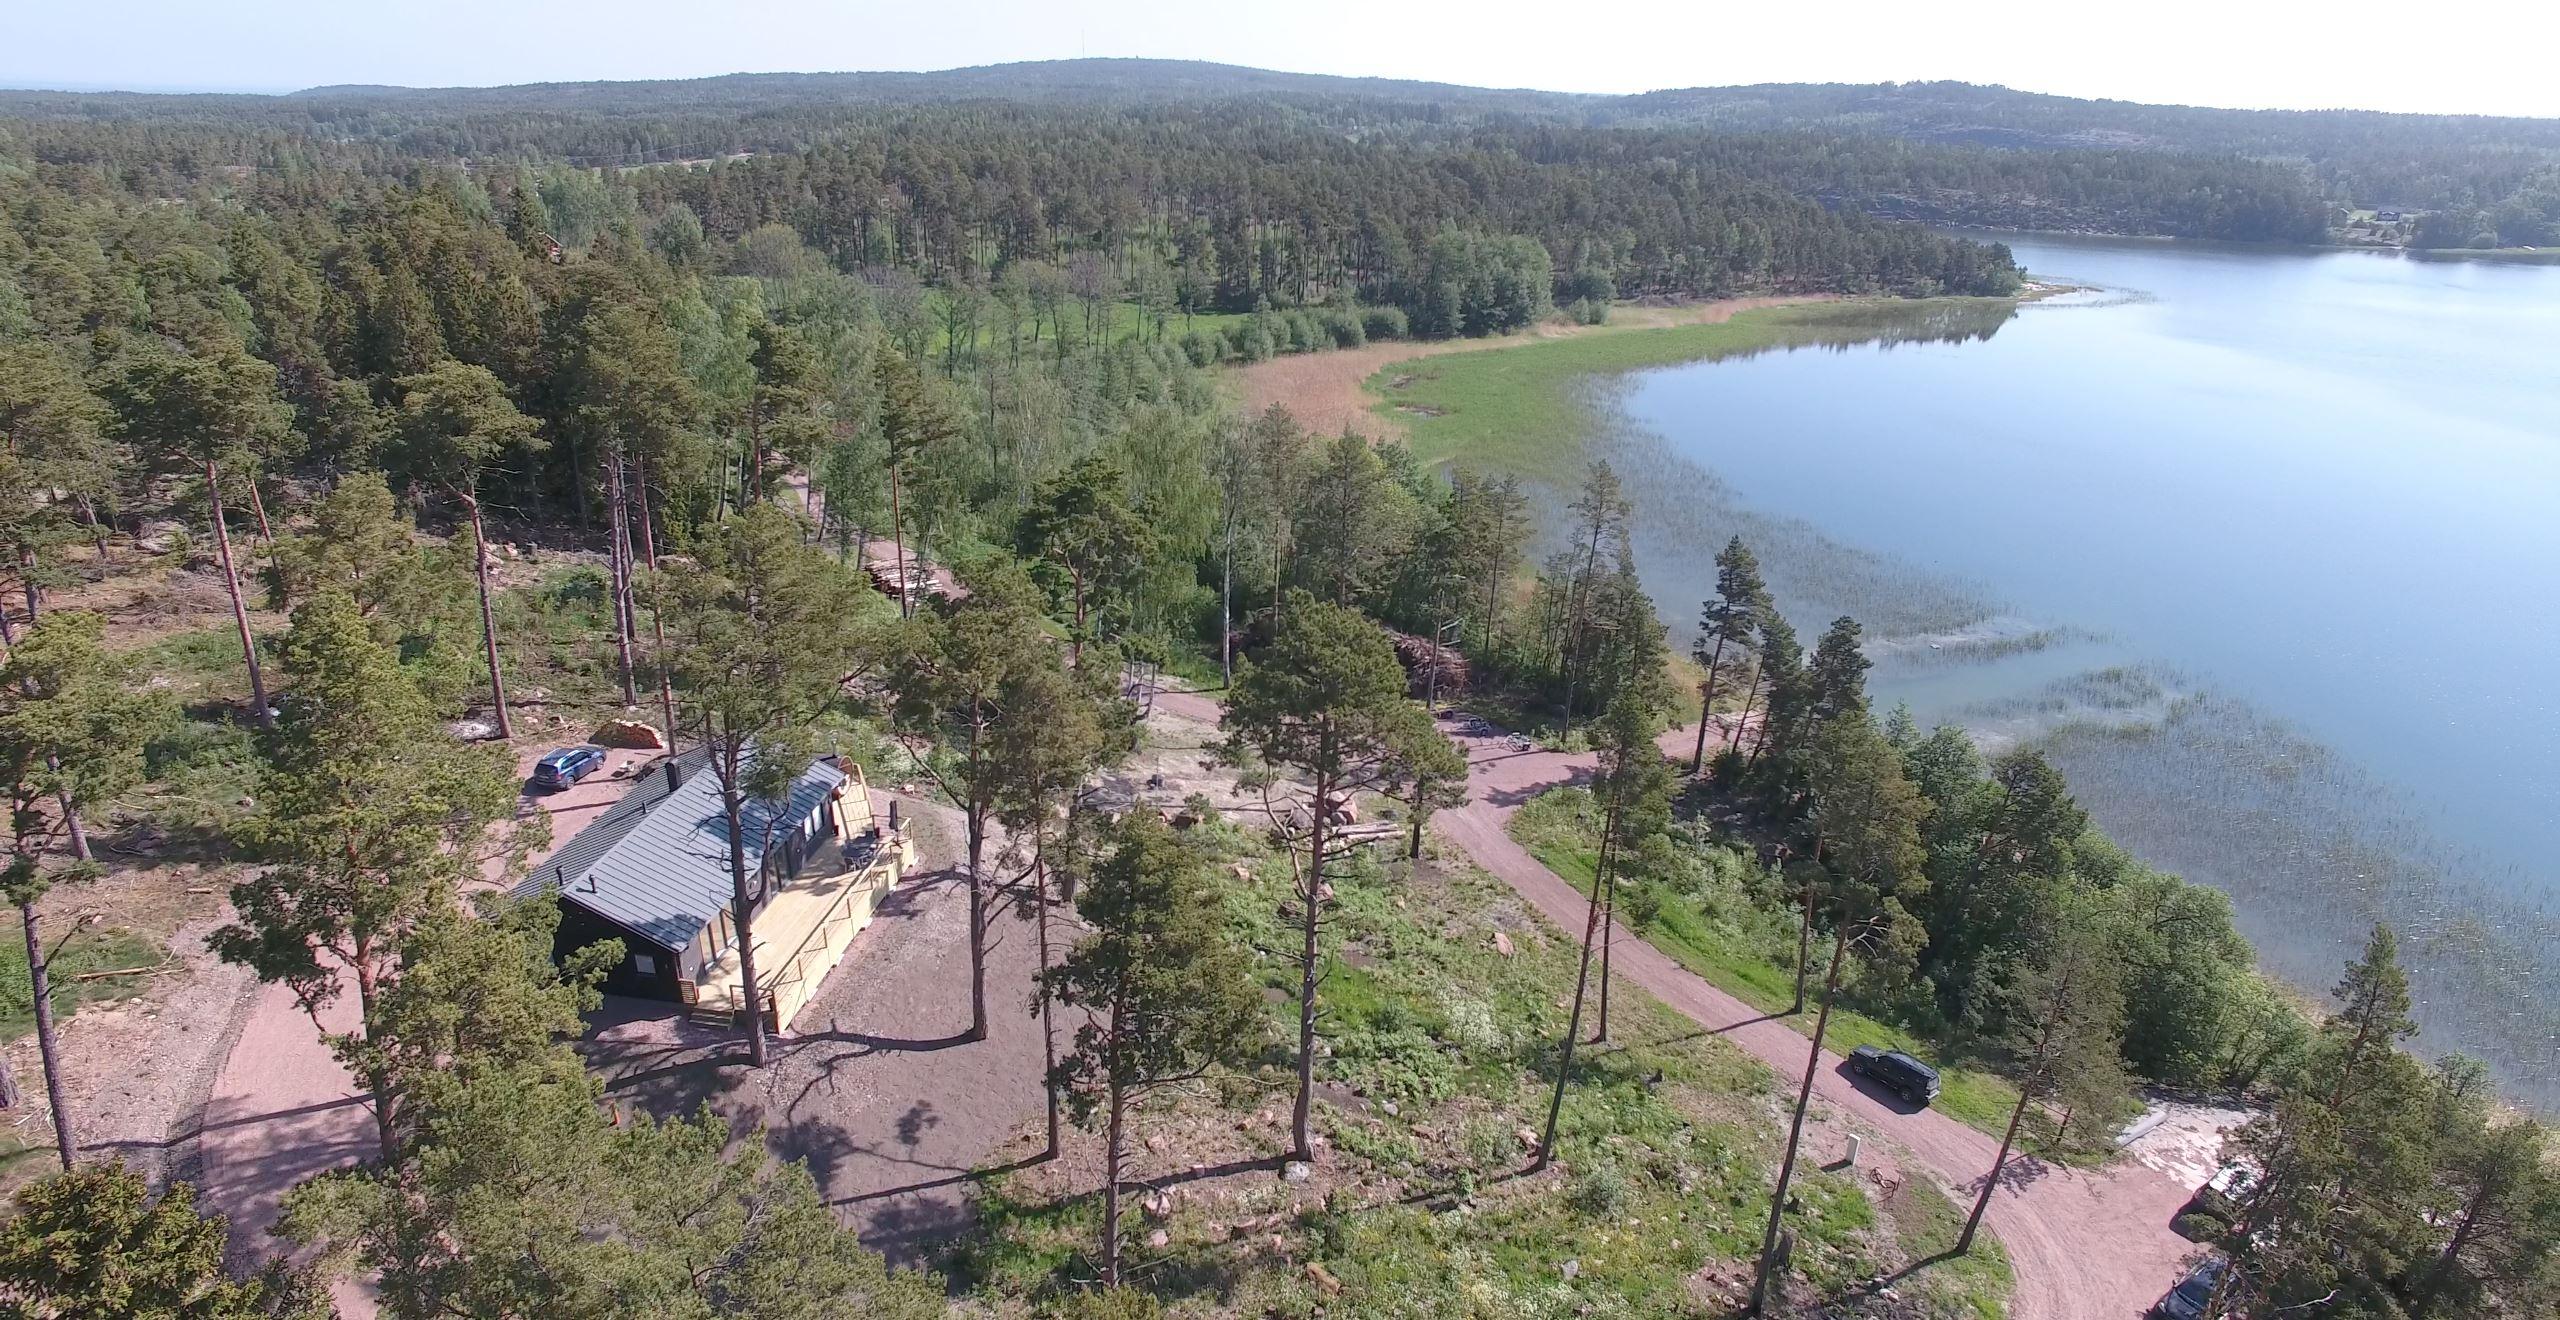 Finnö Stugby